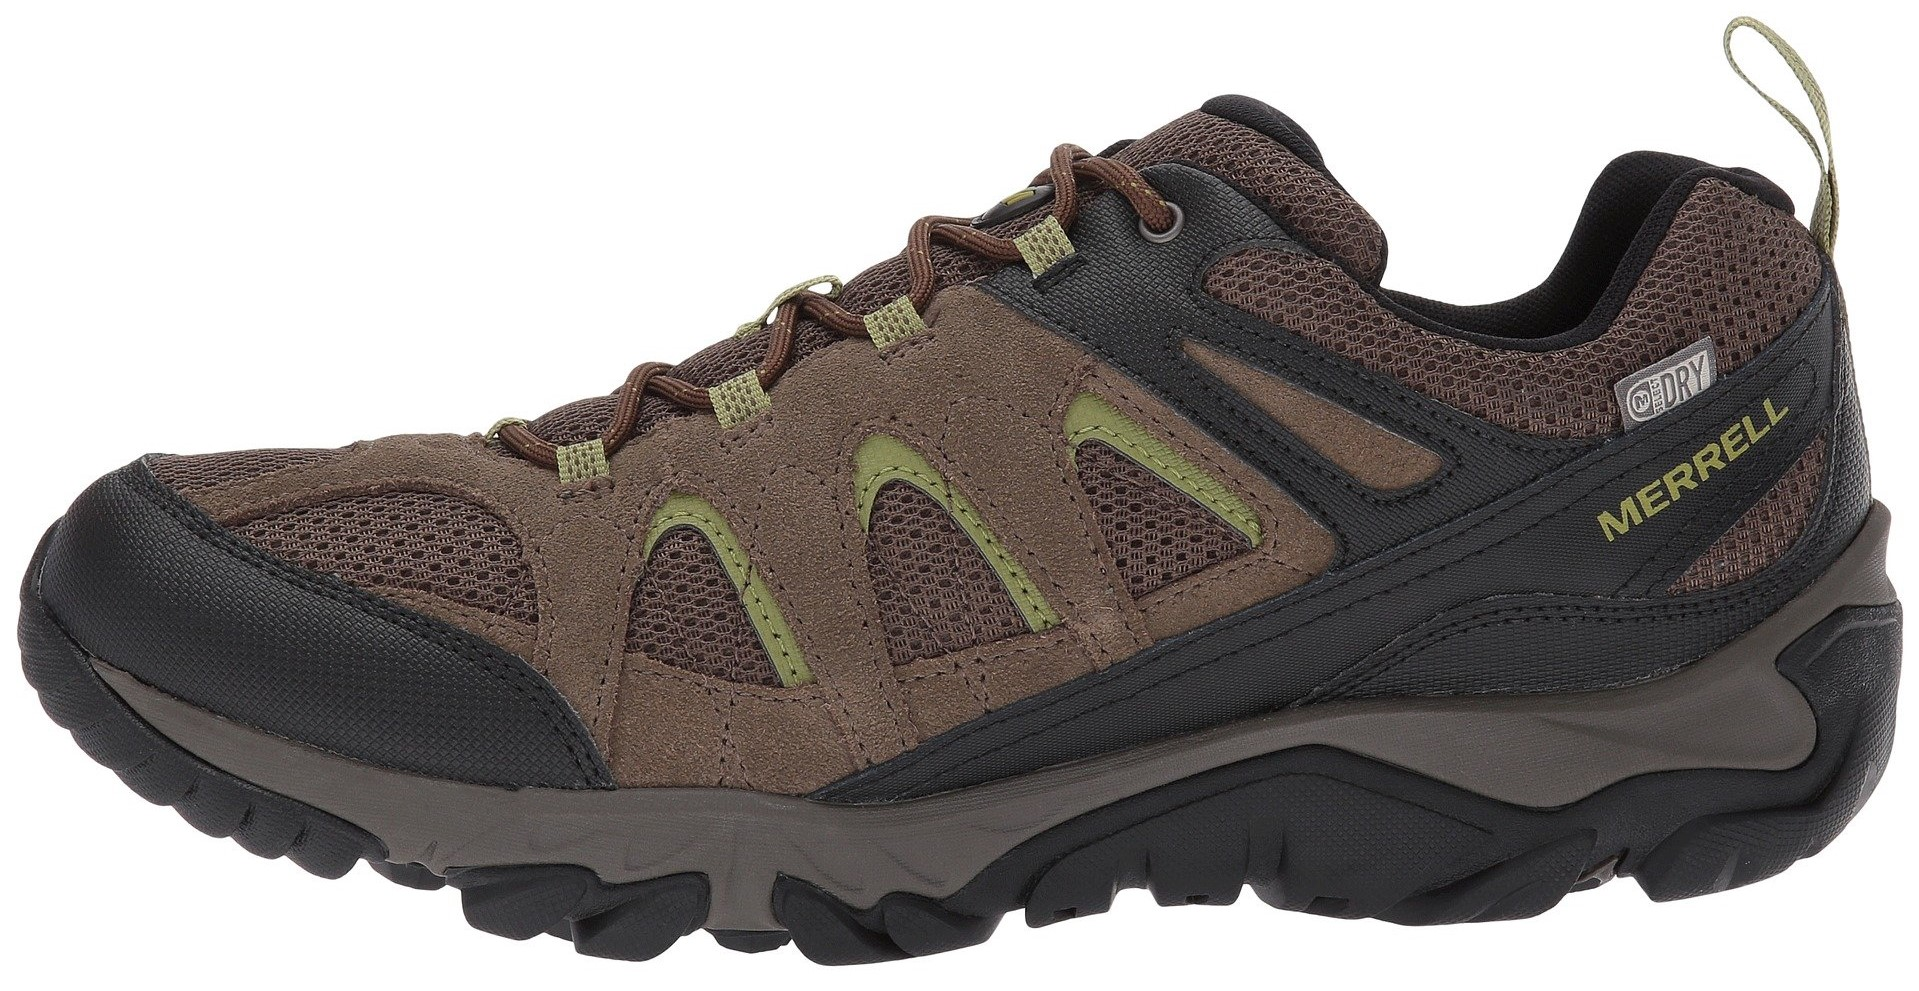 1debbf03438 Zapato Merrell Outmost Vent GTX Marrón/Verde - Peregrinoteca